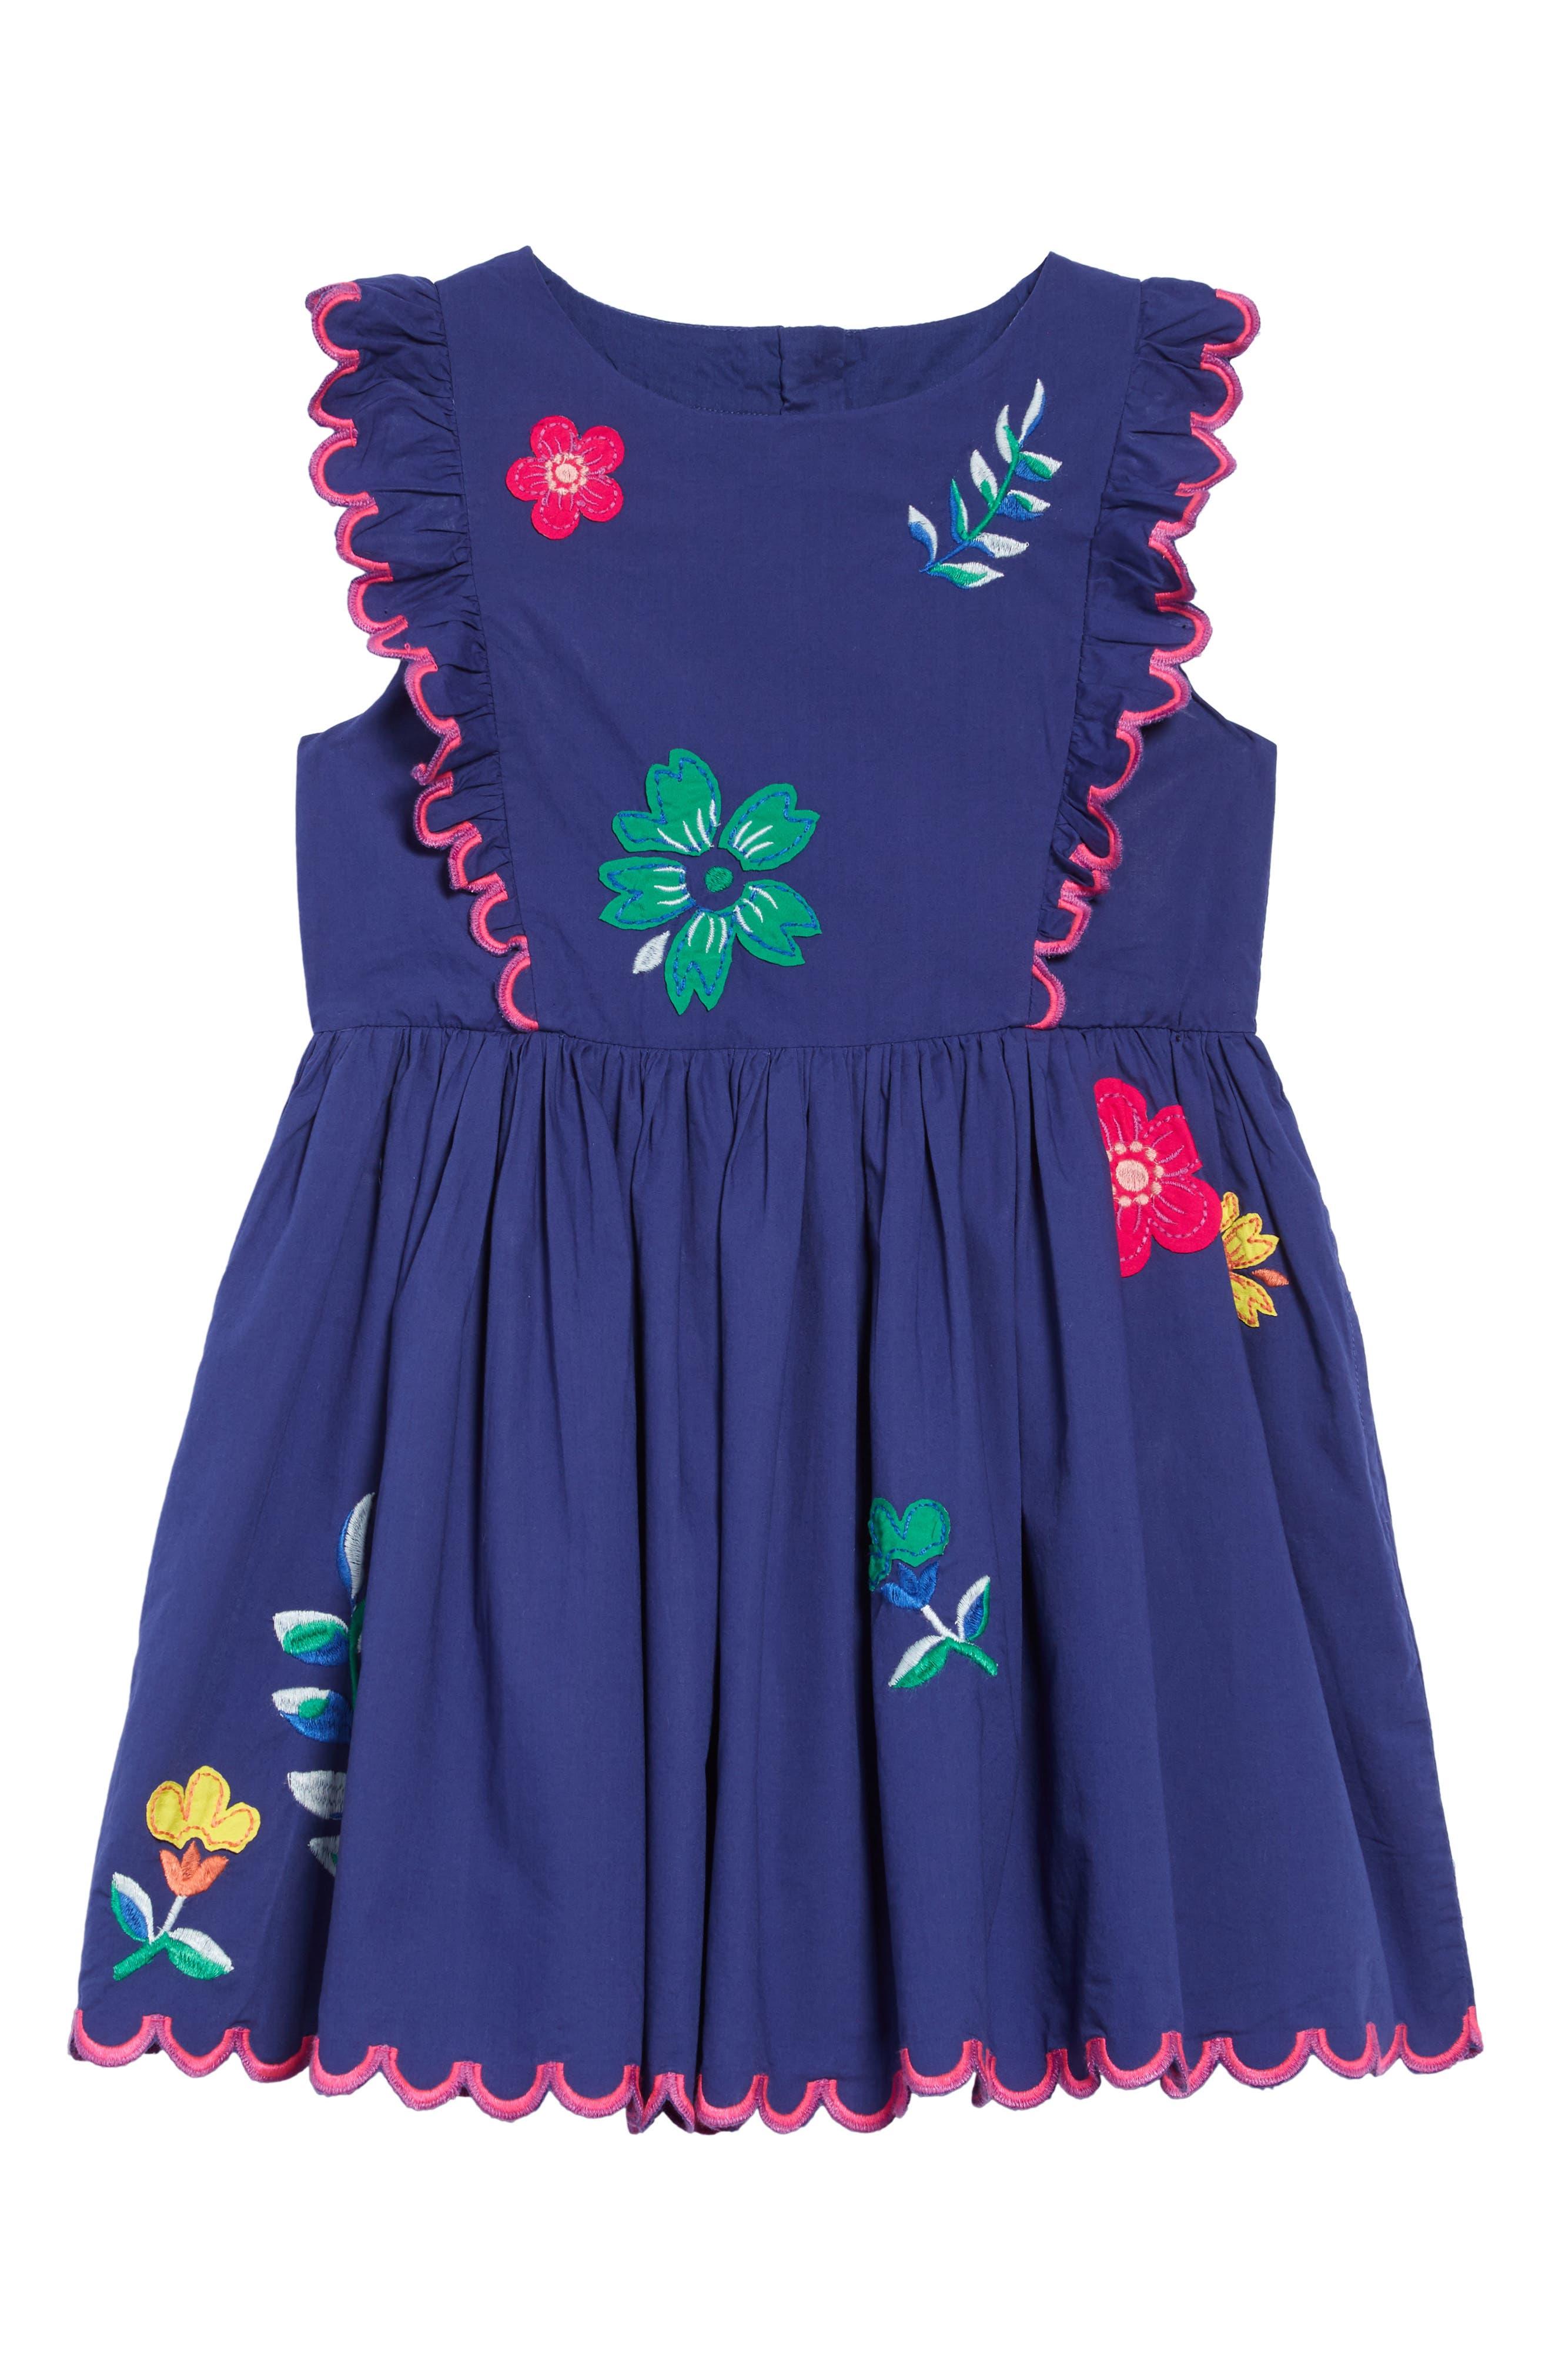 a08951edc7 twirl dress little girls